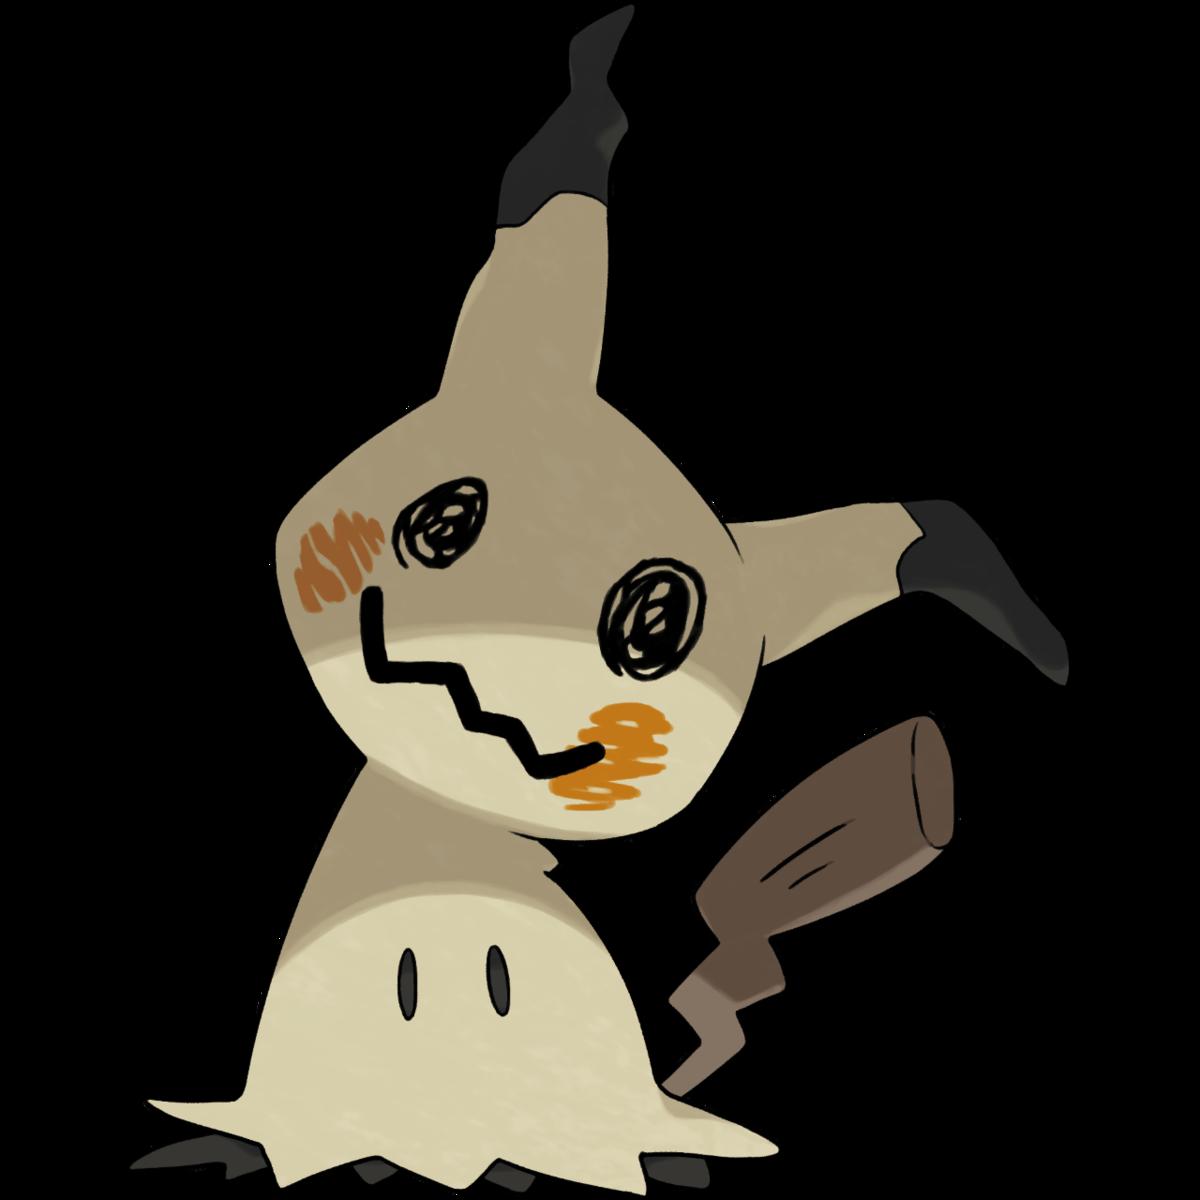 Mimikyu (Pokémon).